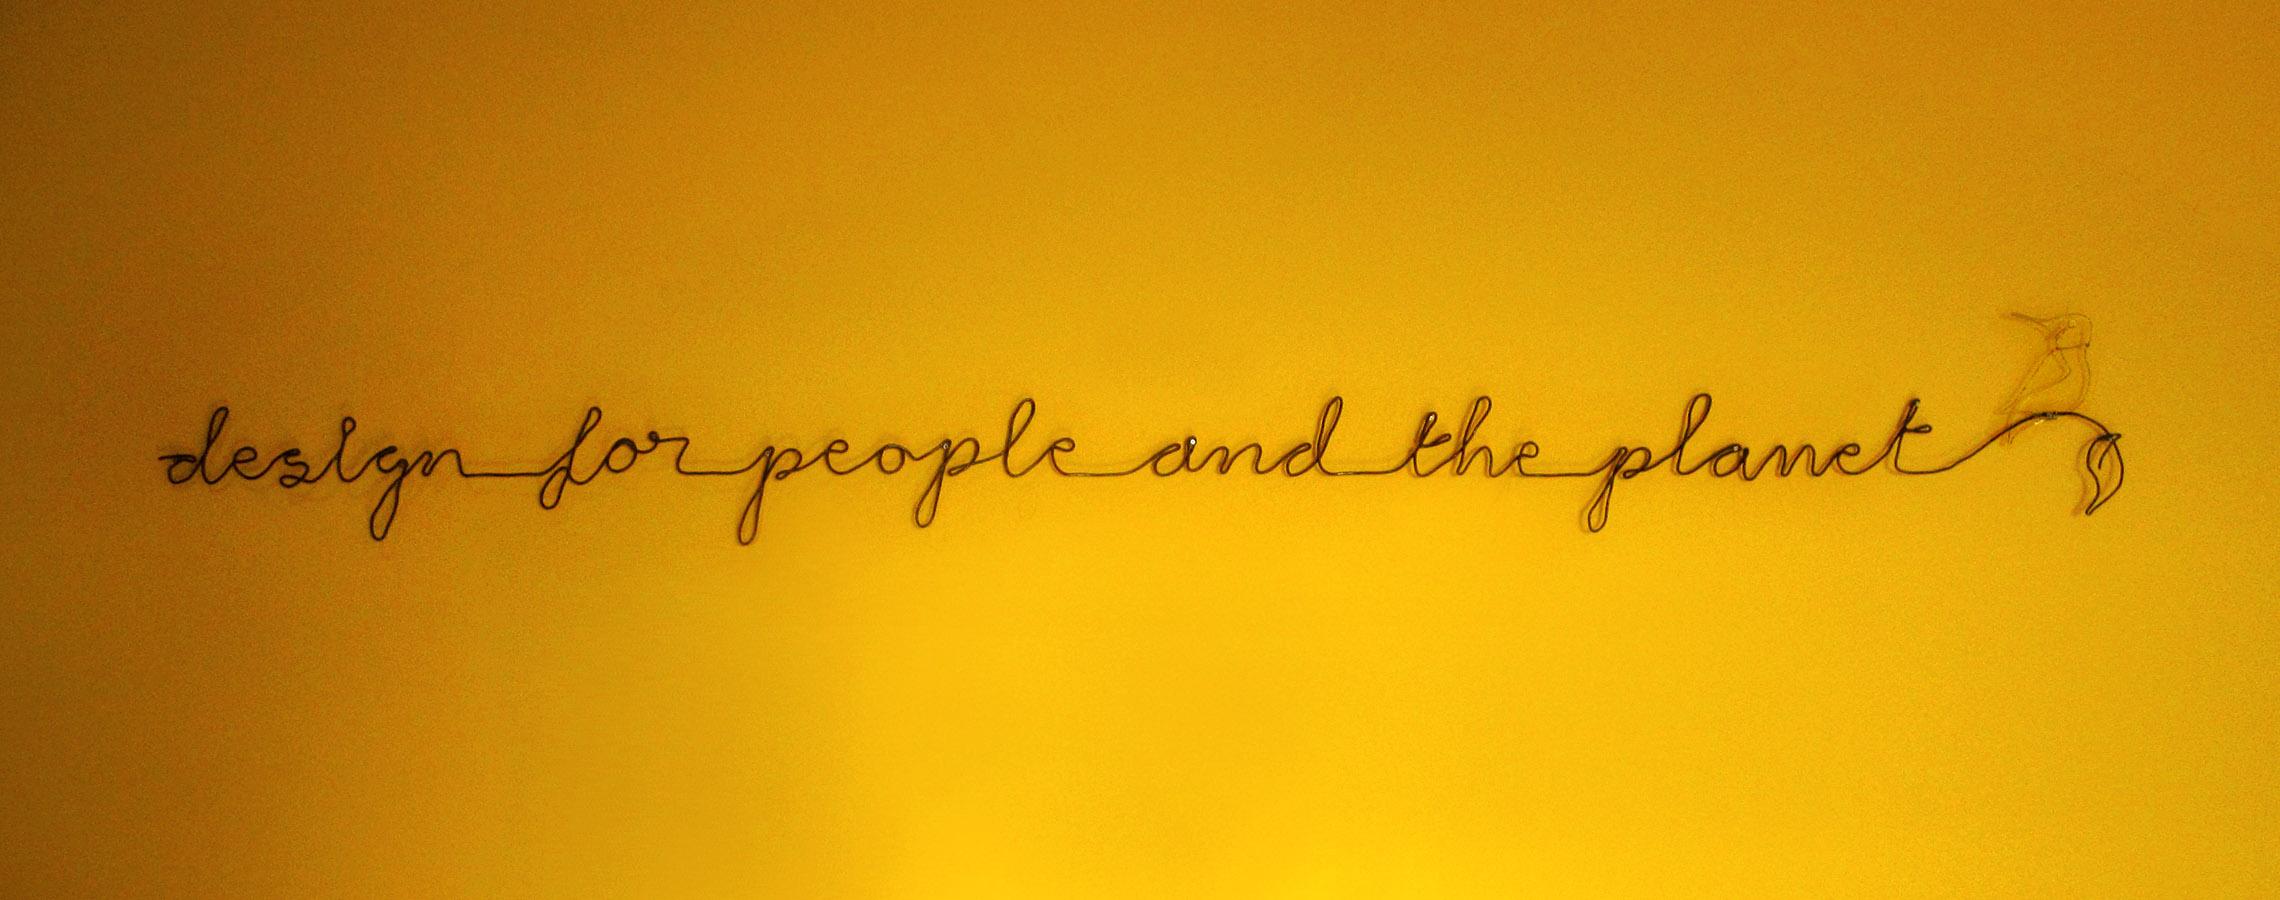 wire-wall-slogan.JPG